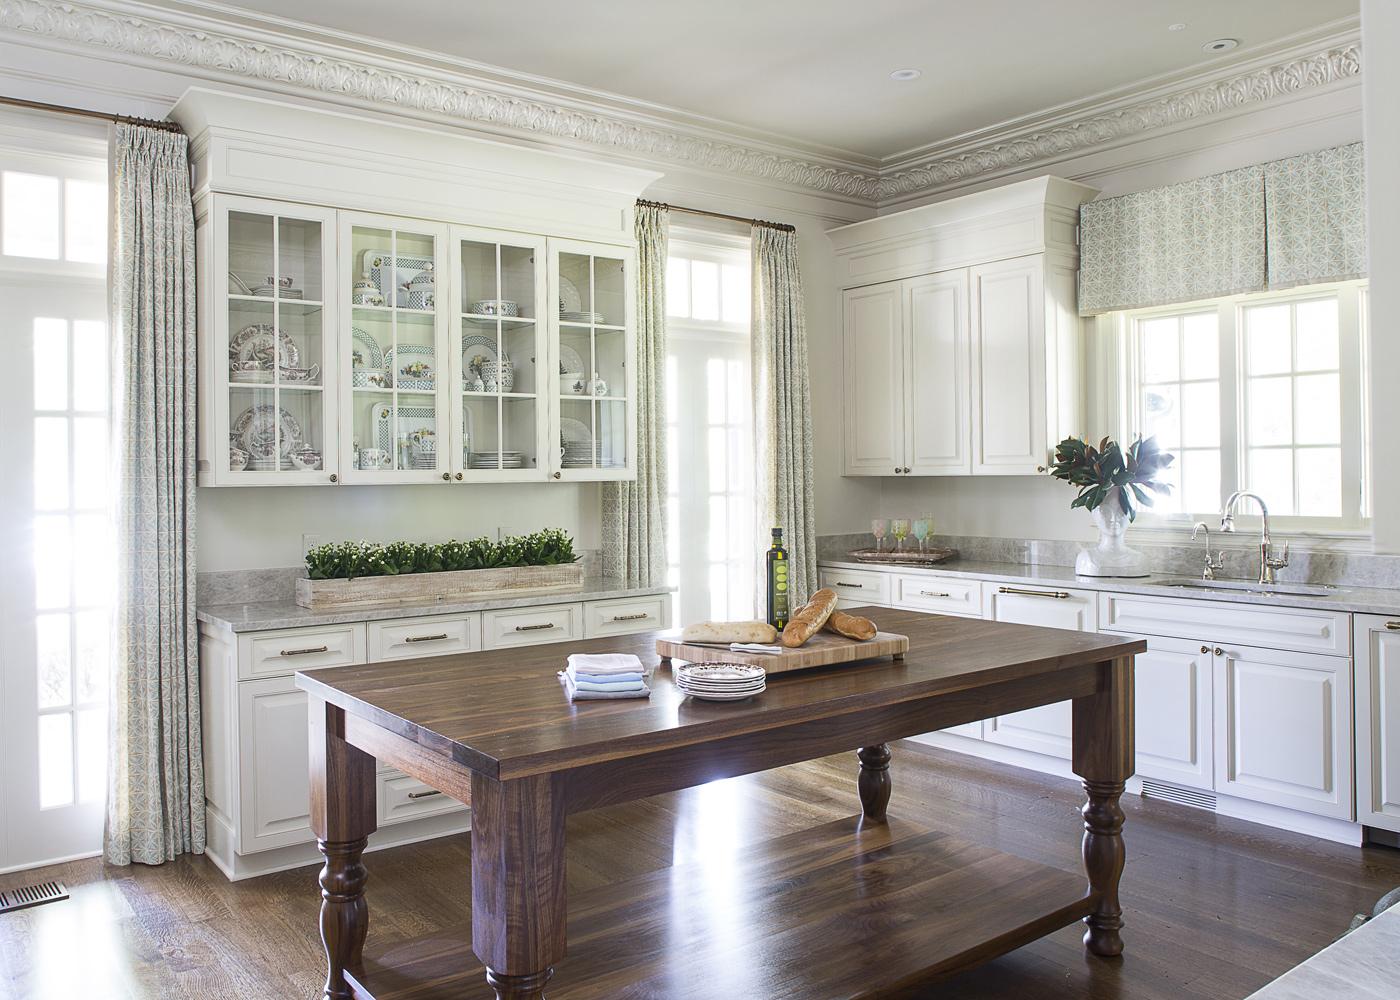 Cindy-McCord-Interior-Design-Collierville-House-002.jpg